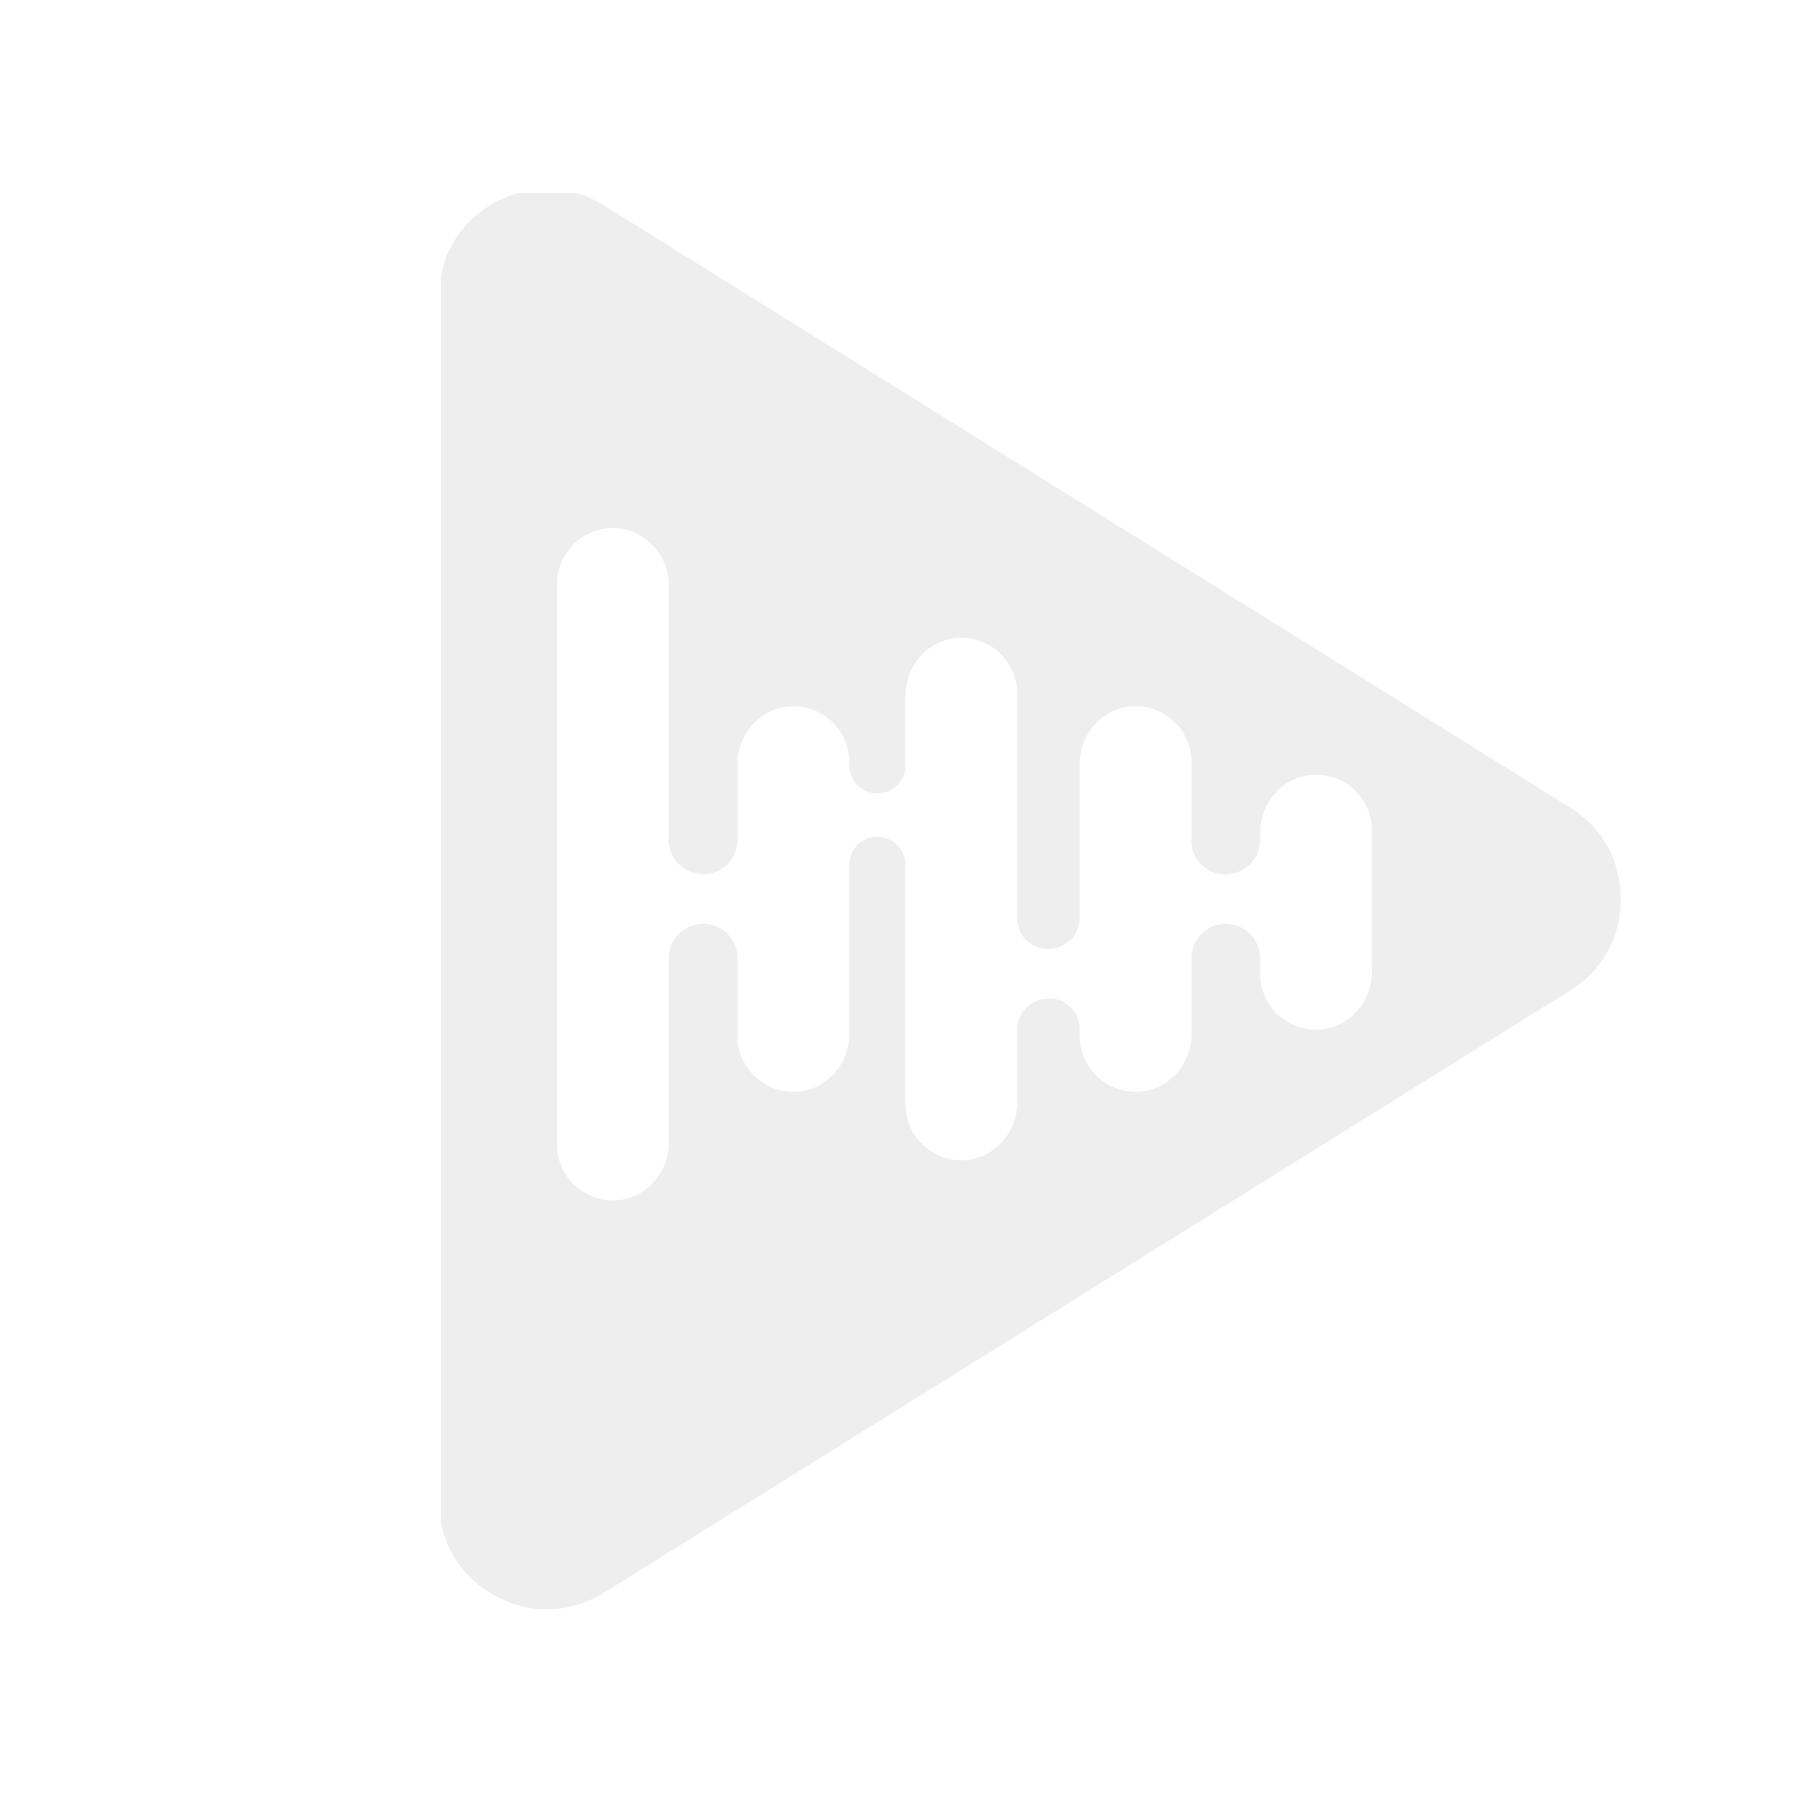 Speedsignal B-3404717-RVC